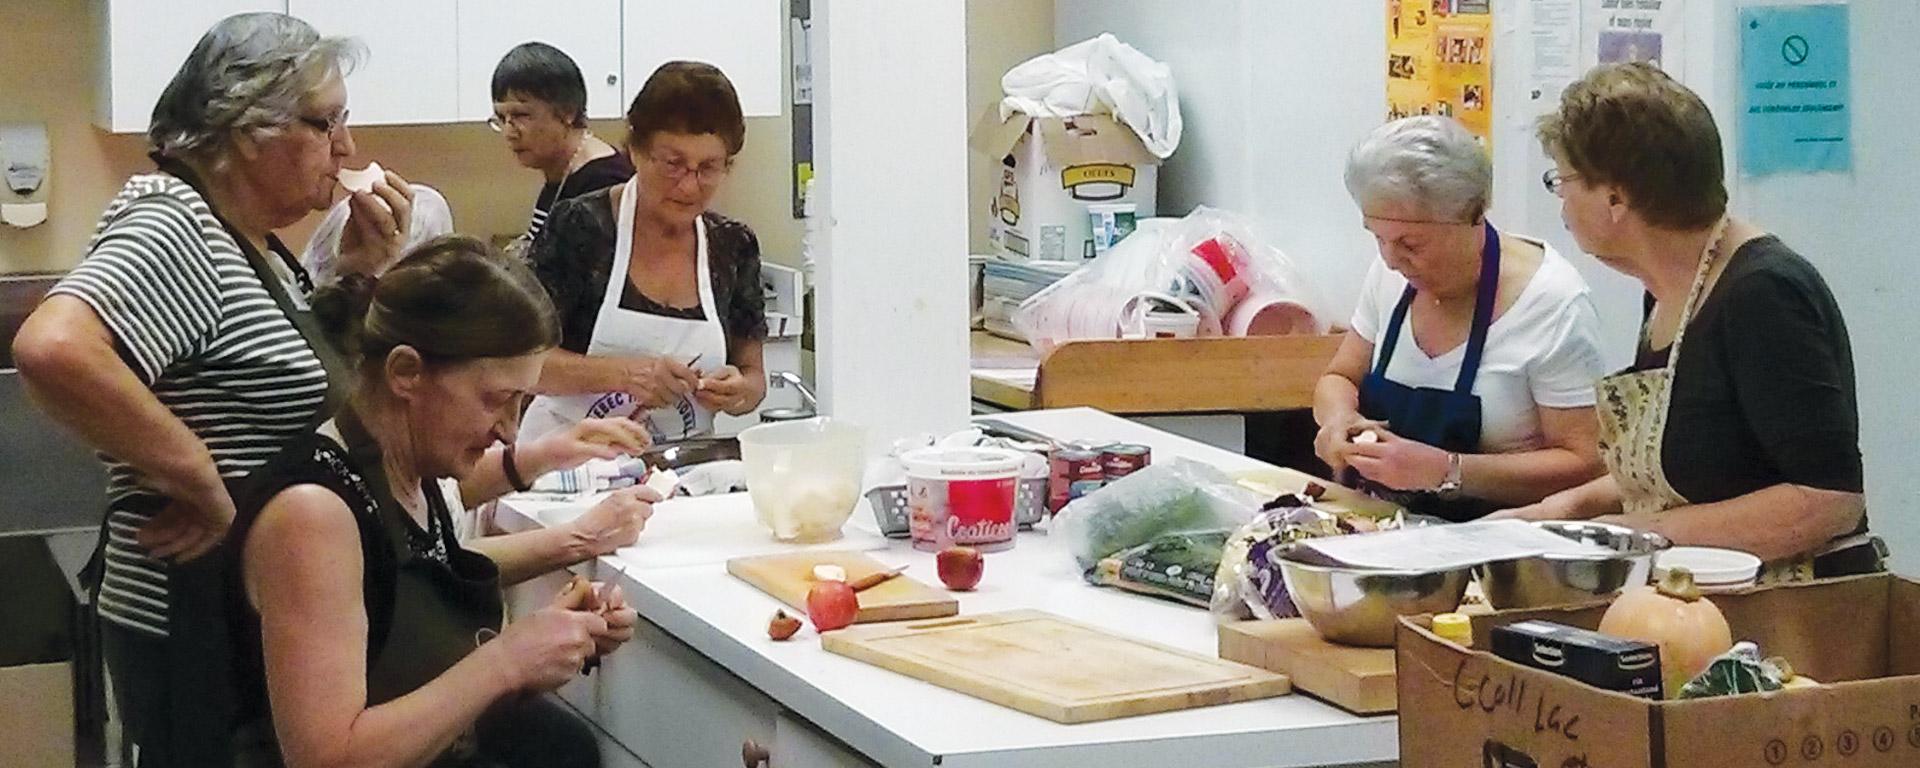 cuisines_coll